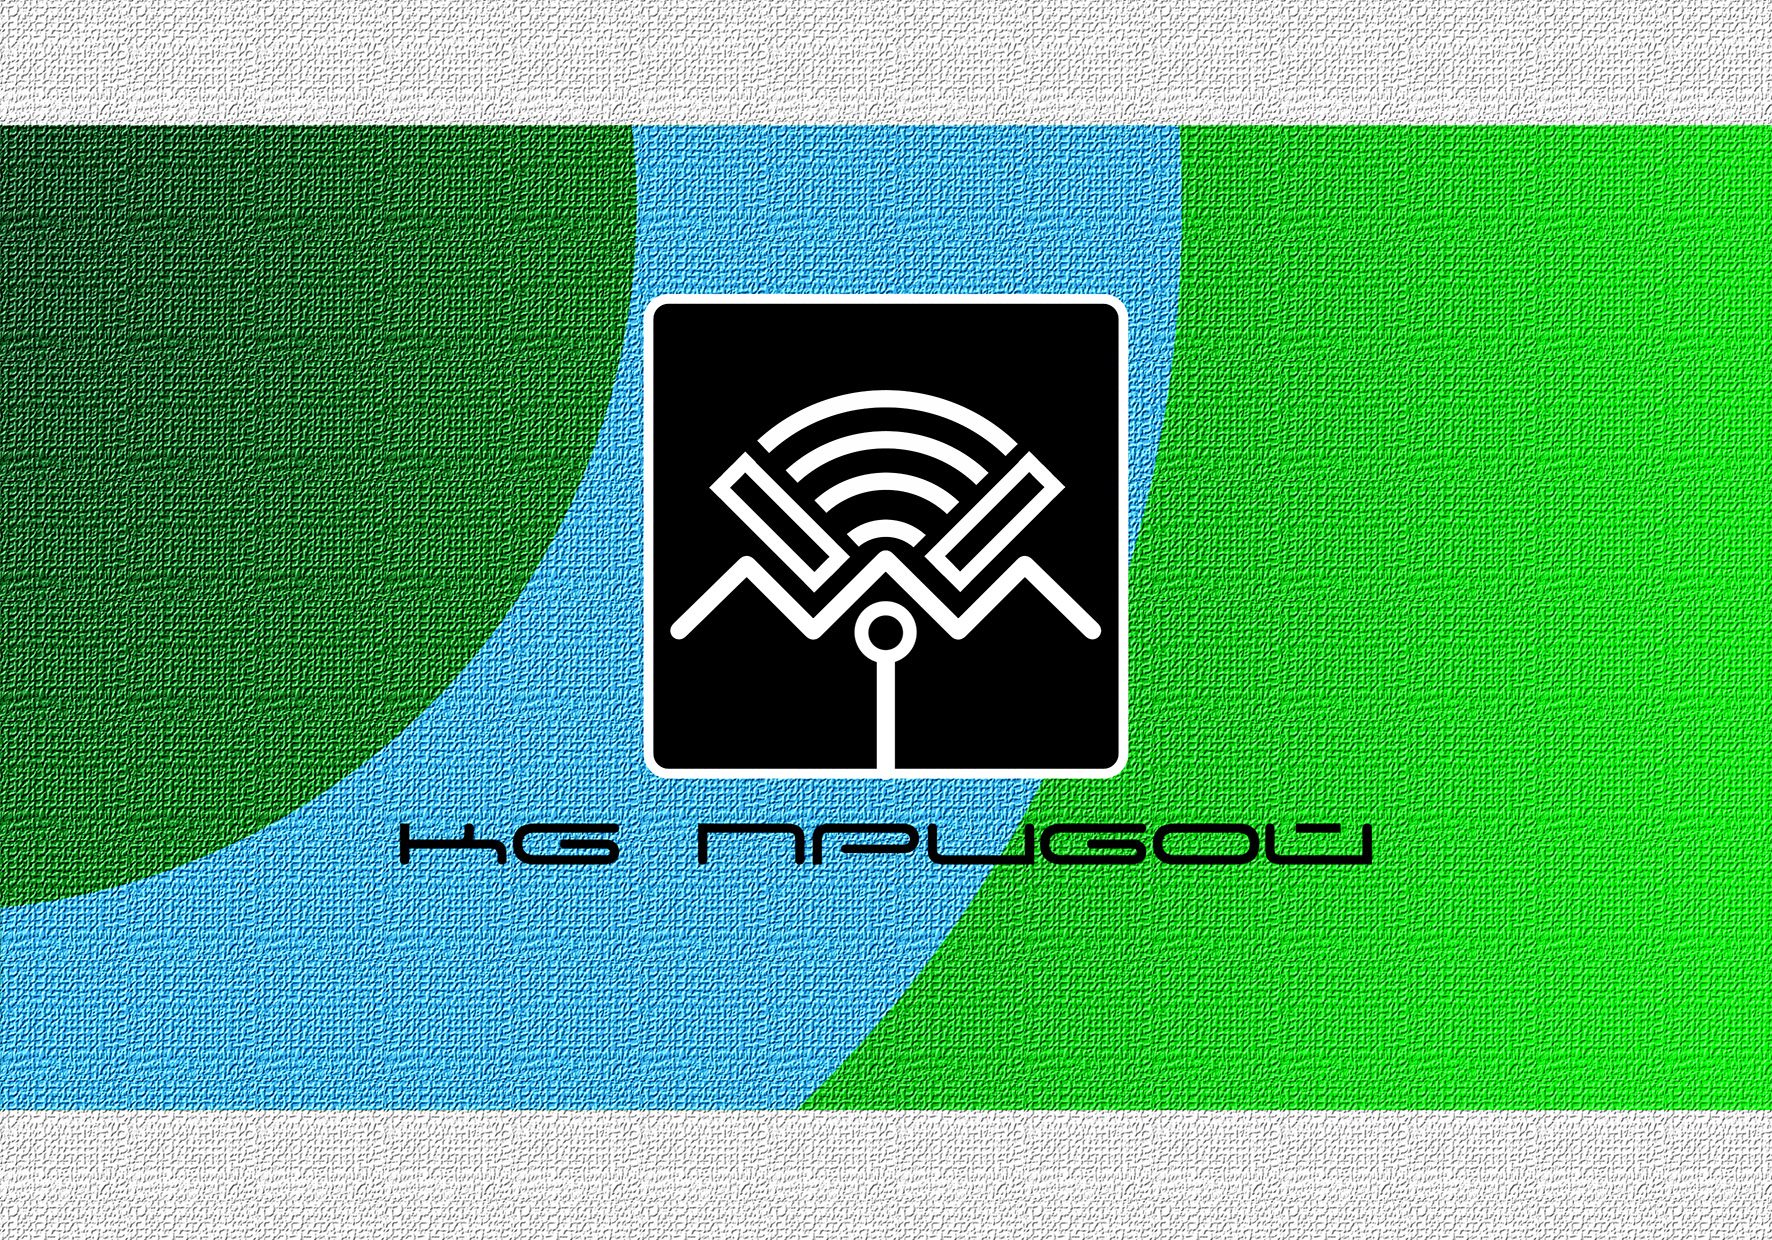 Разработка логотипа и фирменного стиля для КБ Прибой фото f_2815b296ad14a04d.jpg